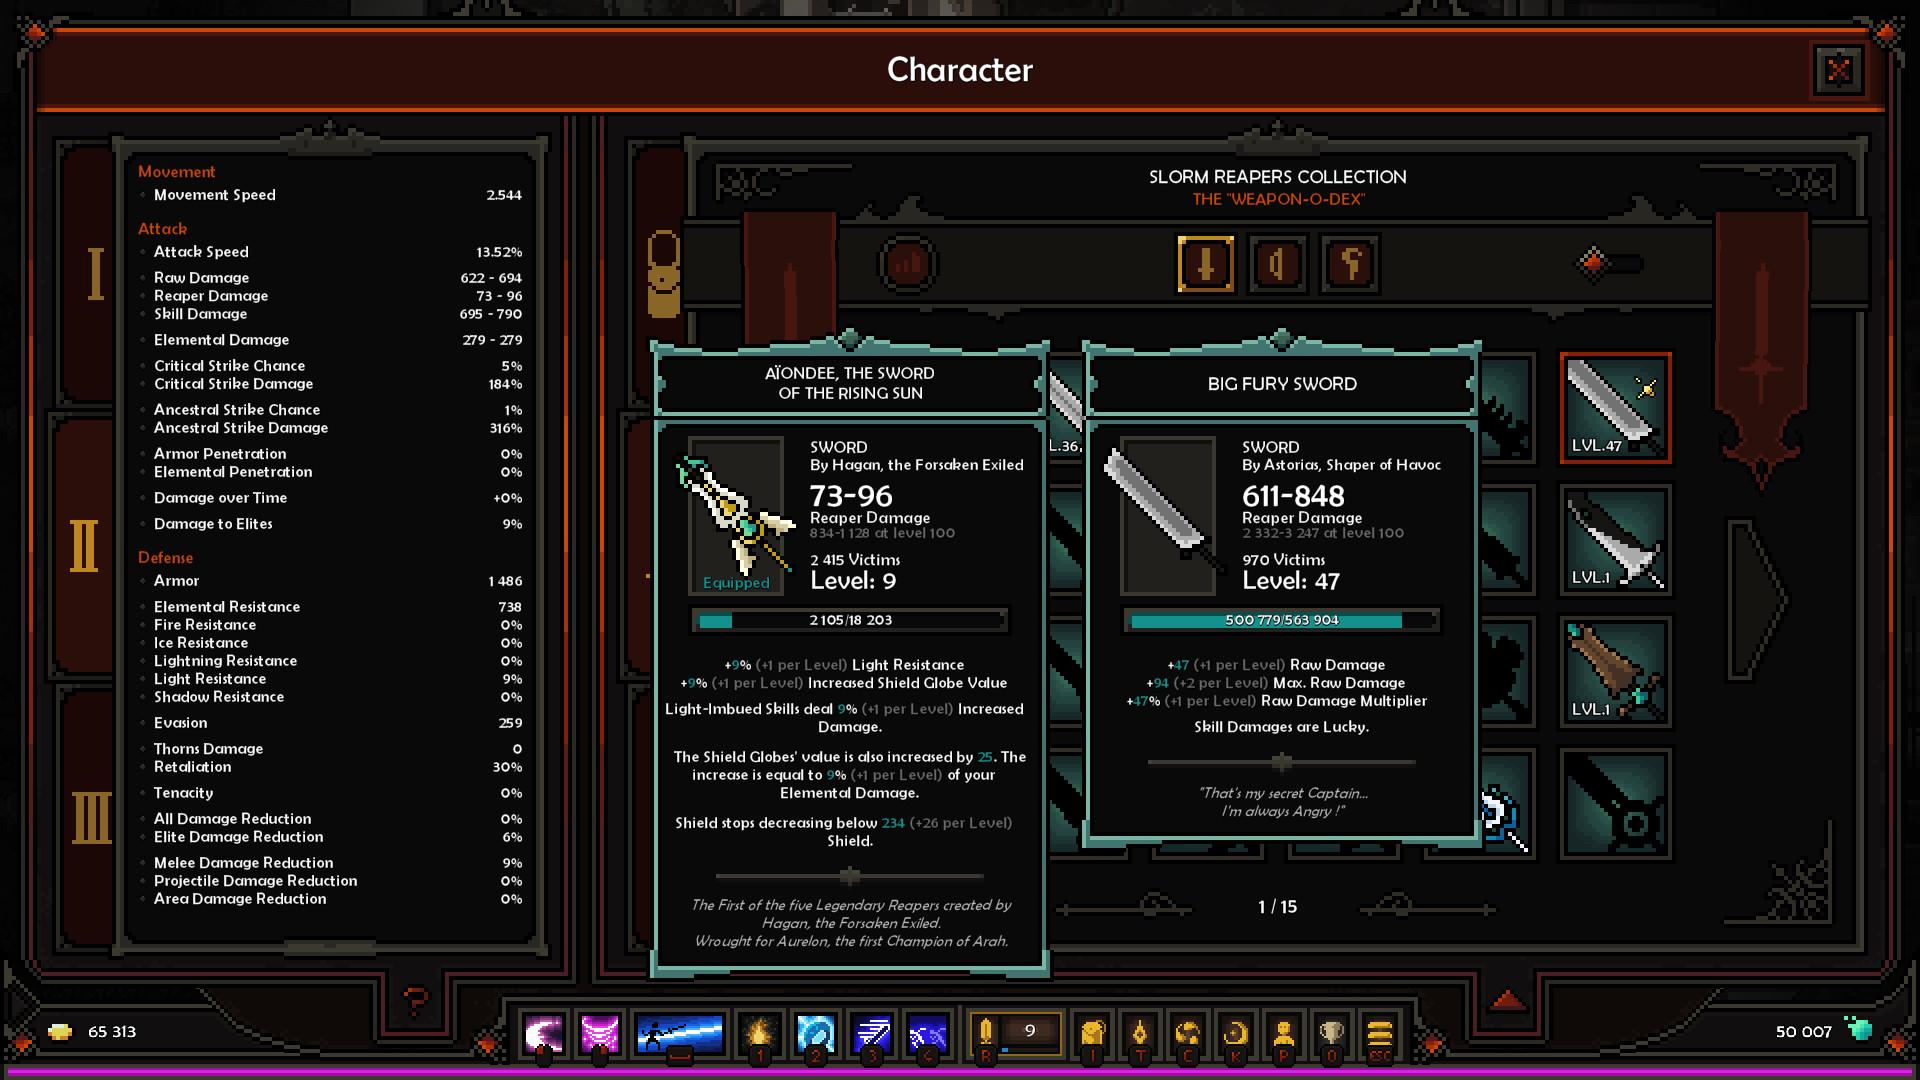 The Slormancer screenshot